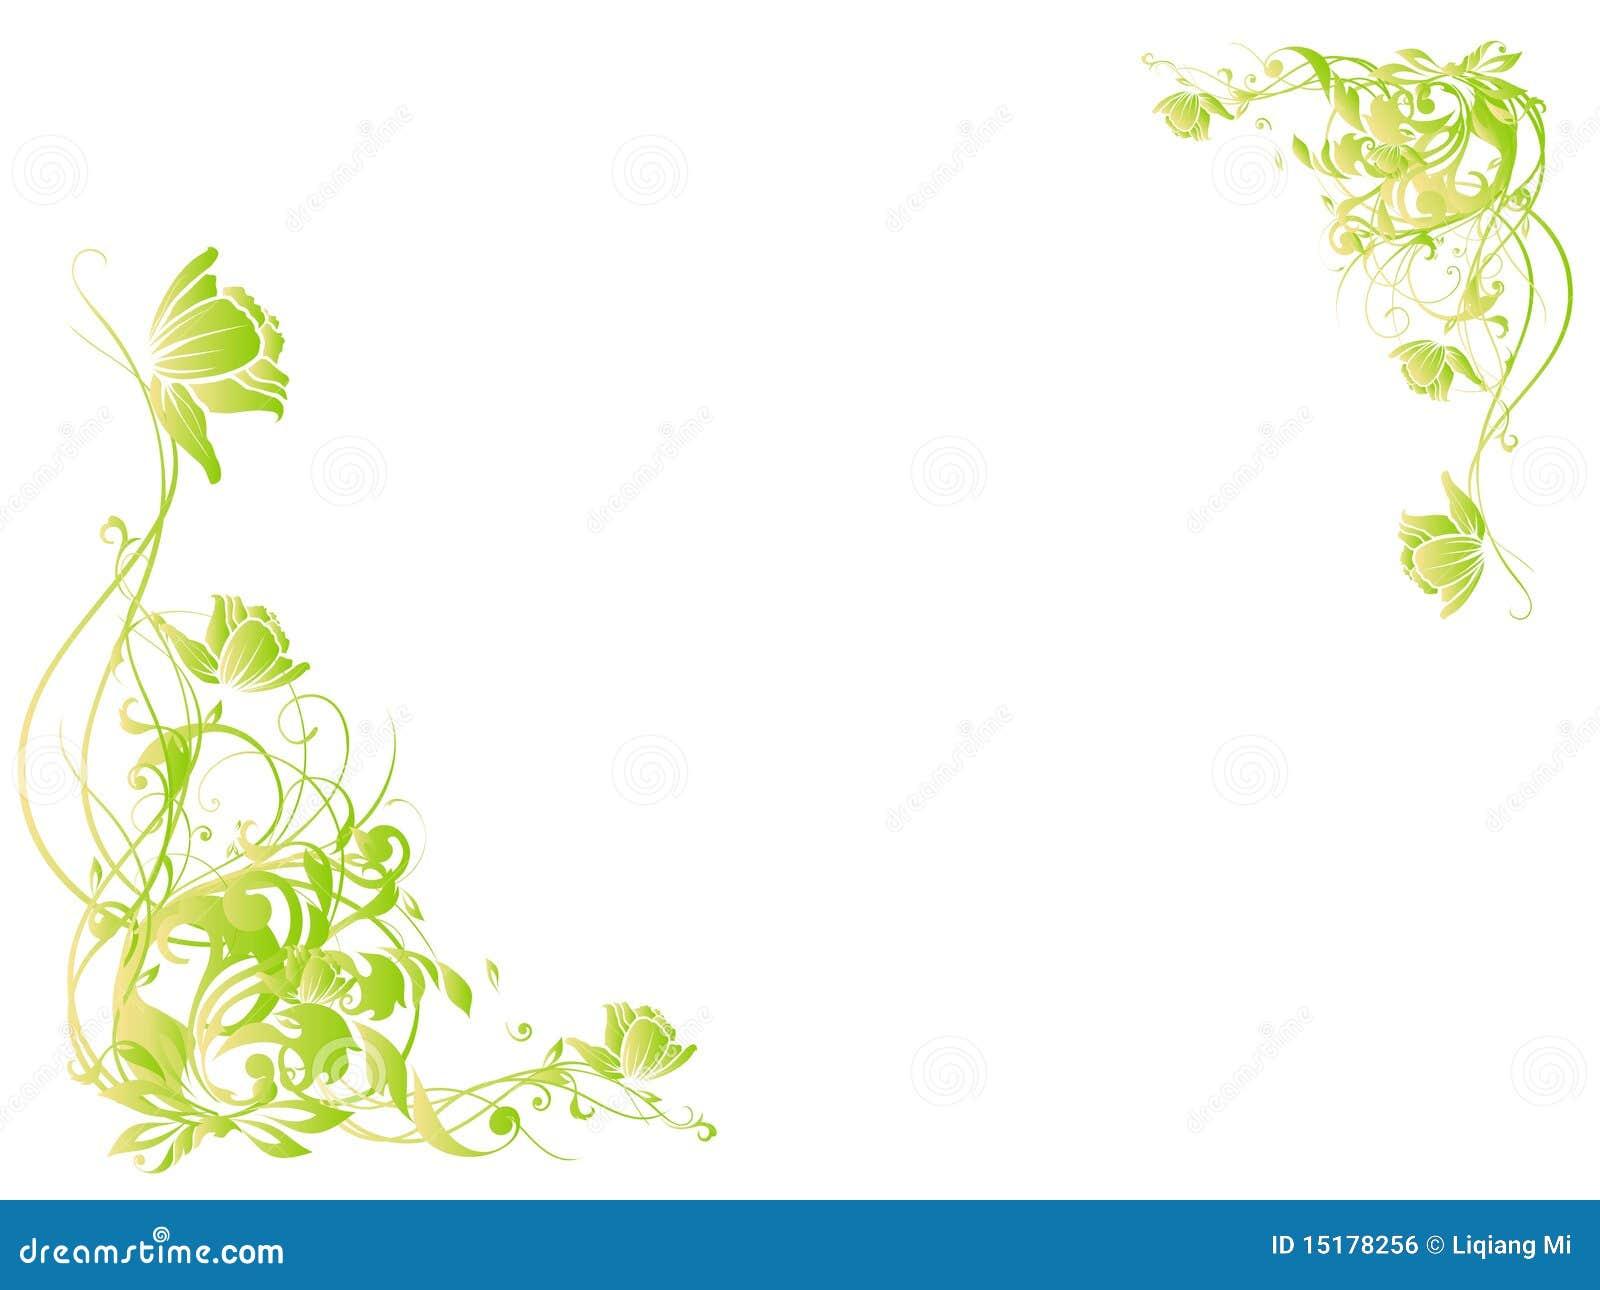 Green vinesGreen Vines